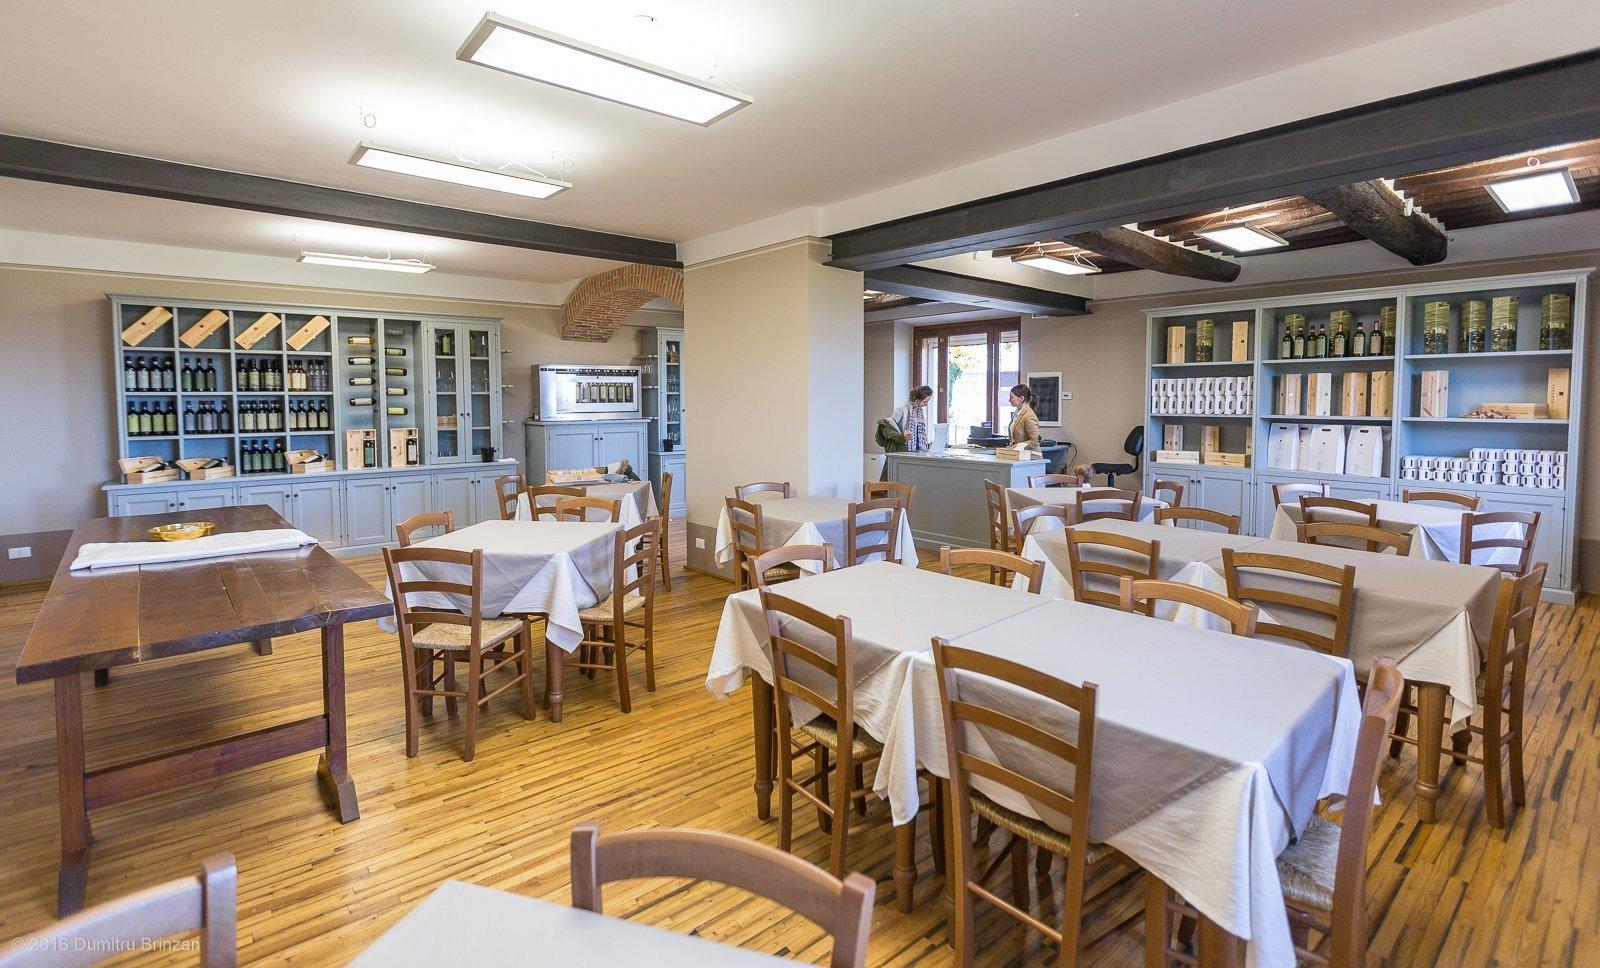 2016-canneto-winery-montepulciano-16